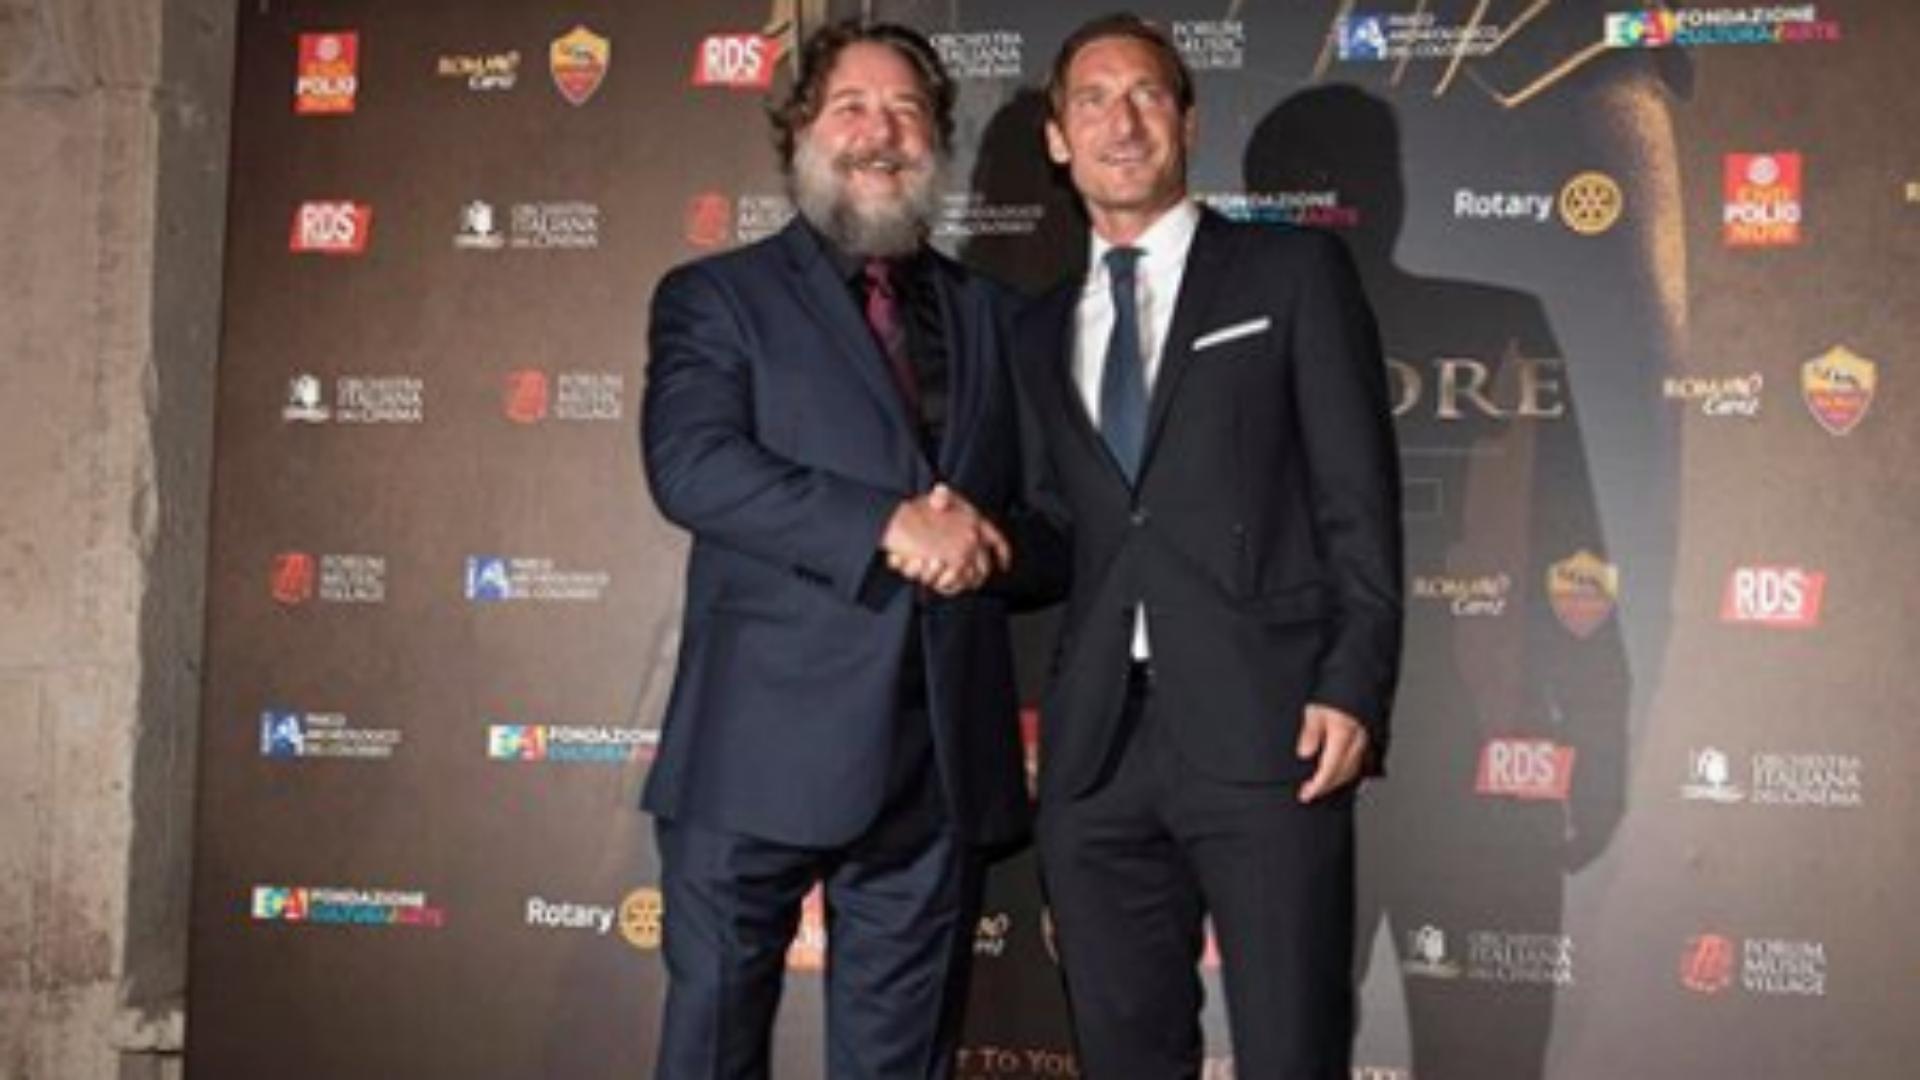 ¿Cuánto mide Russell Crowe? - Altura - Real height - Página 4 Totti-russel-crowe_1b64nhxrd24pq1a107z4gajg7i